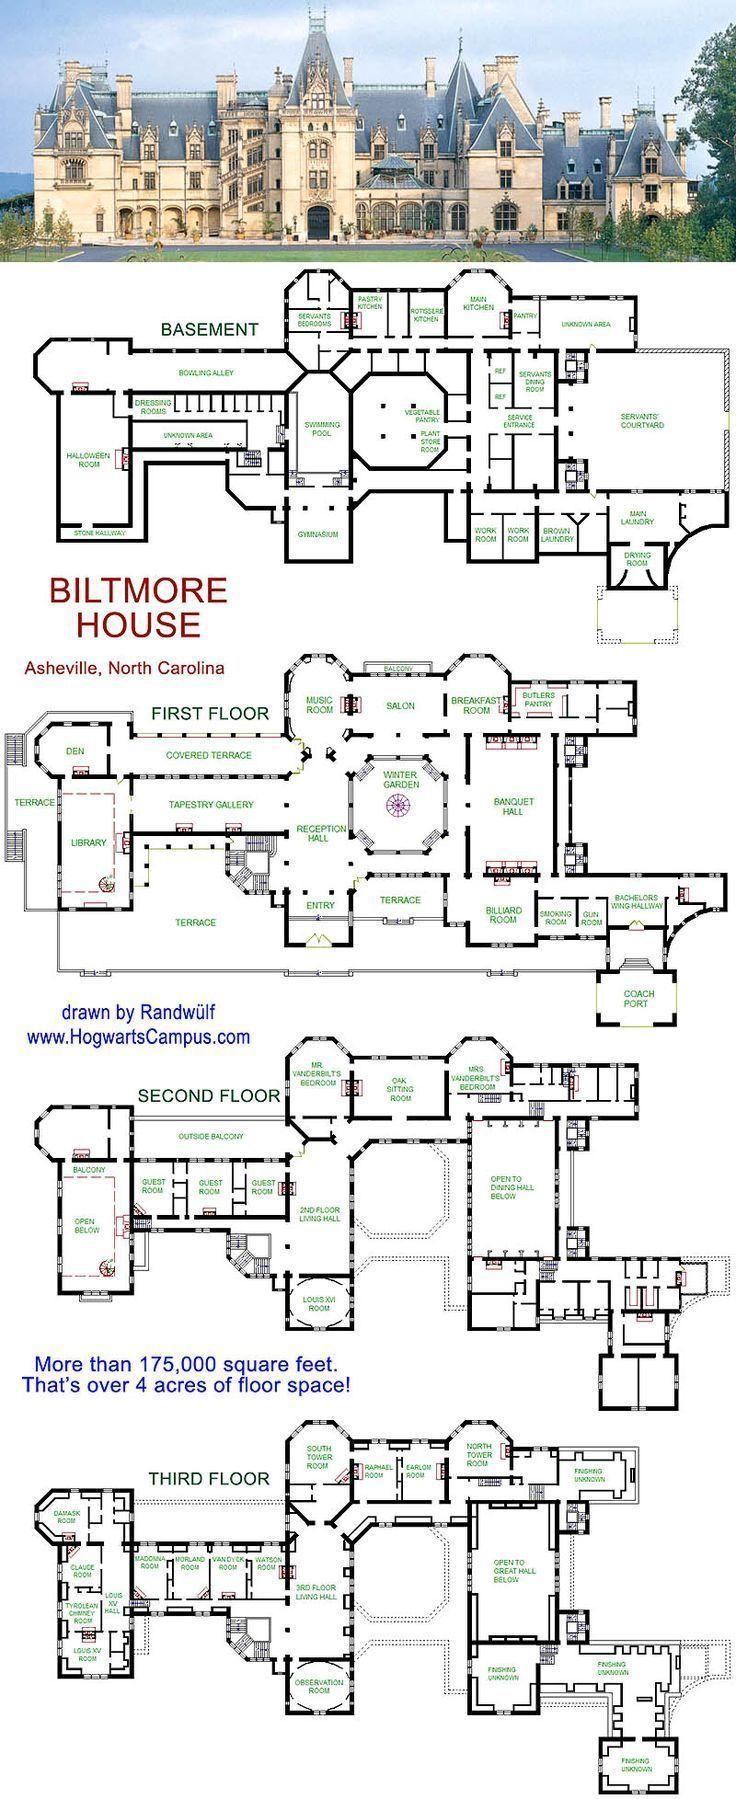 image result for minecraft mansion ideas houses haus grundriss sims haus und haus plane